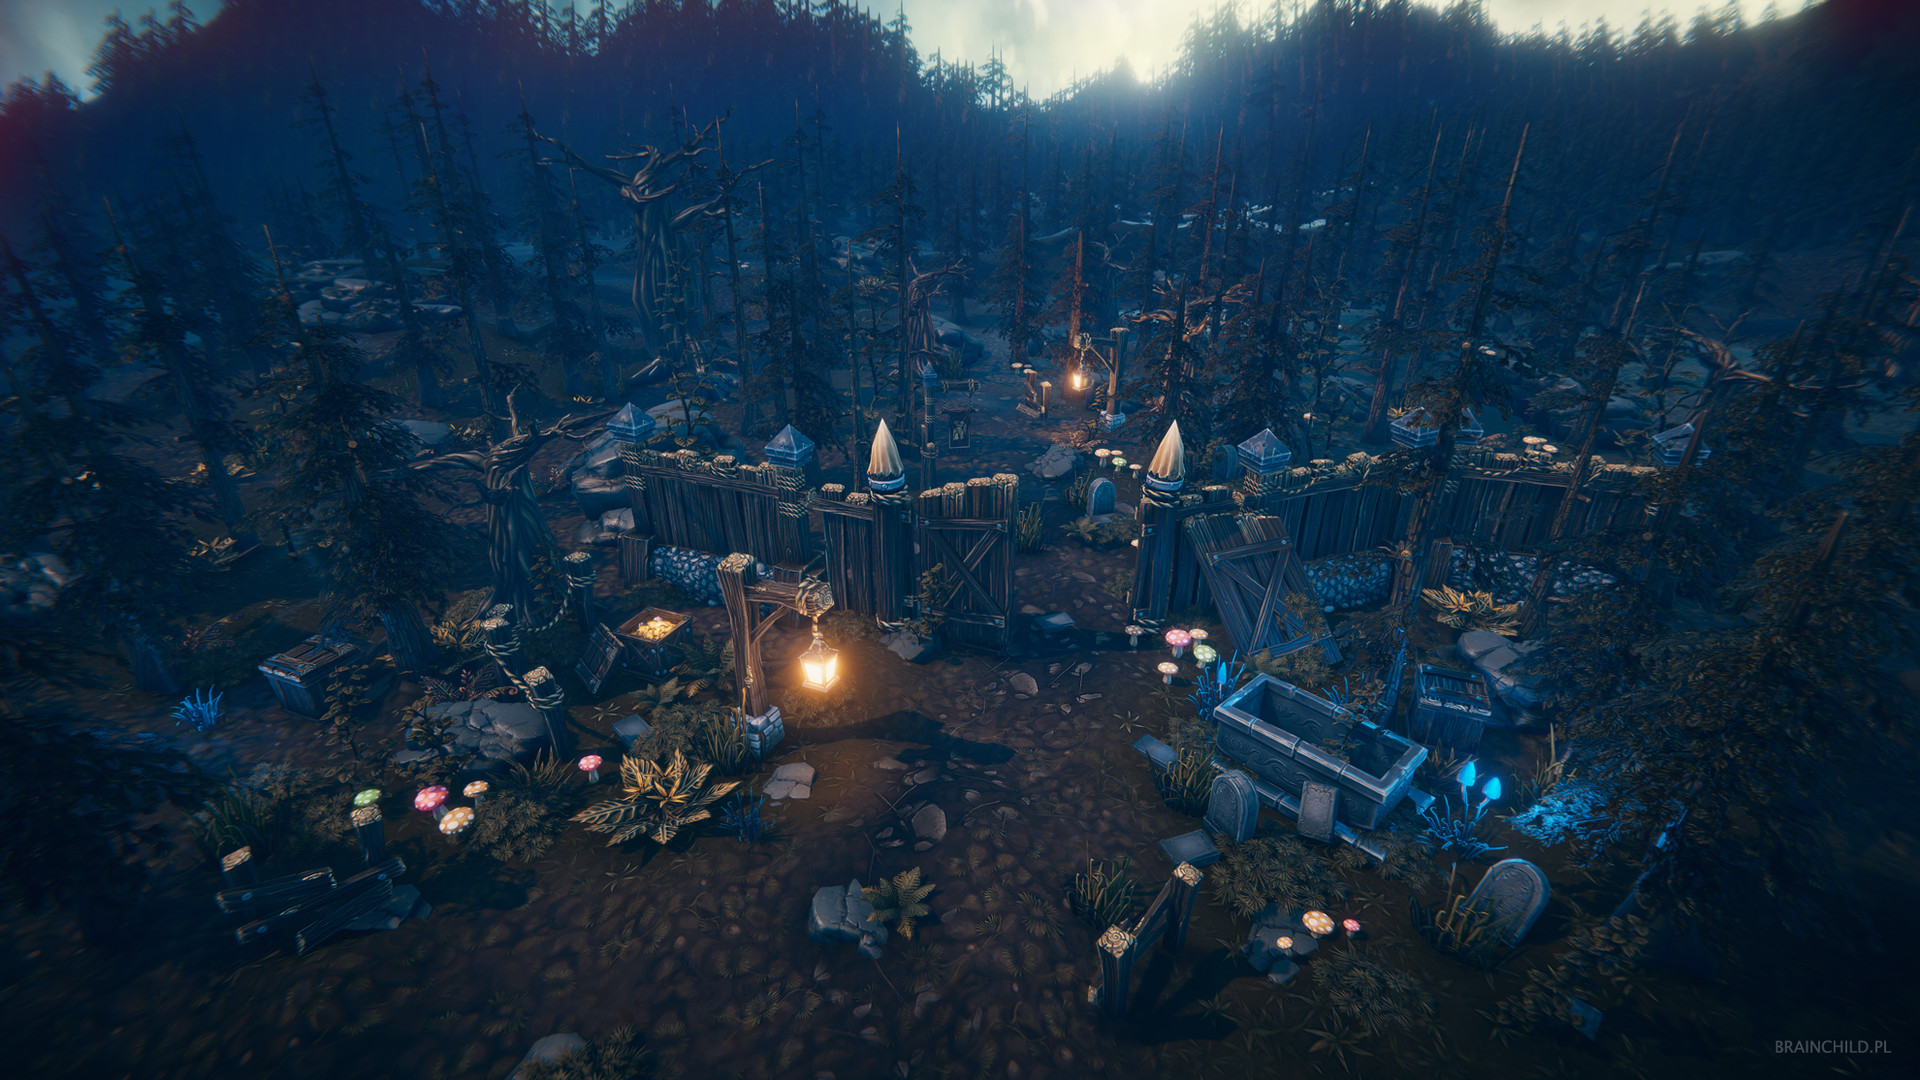 Low Poly models - RPG asset pack / Unity5 / Forbidden Forest